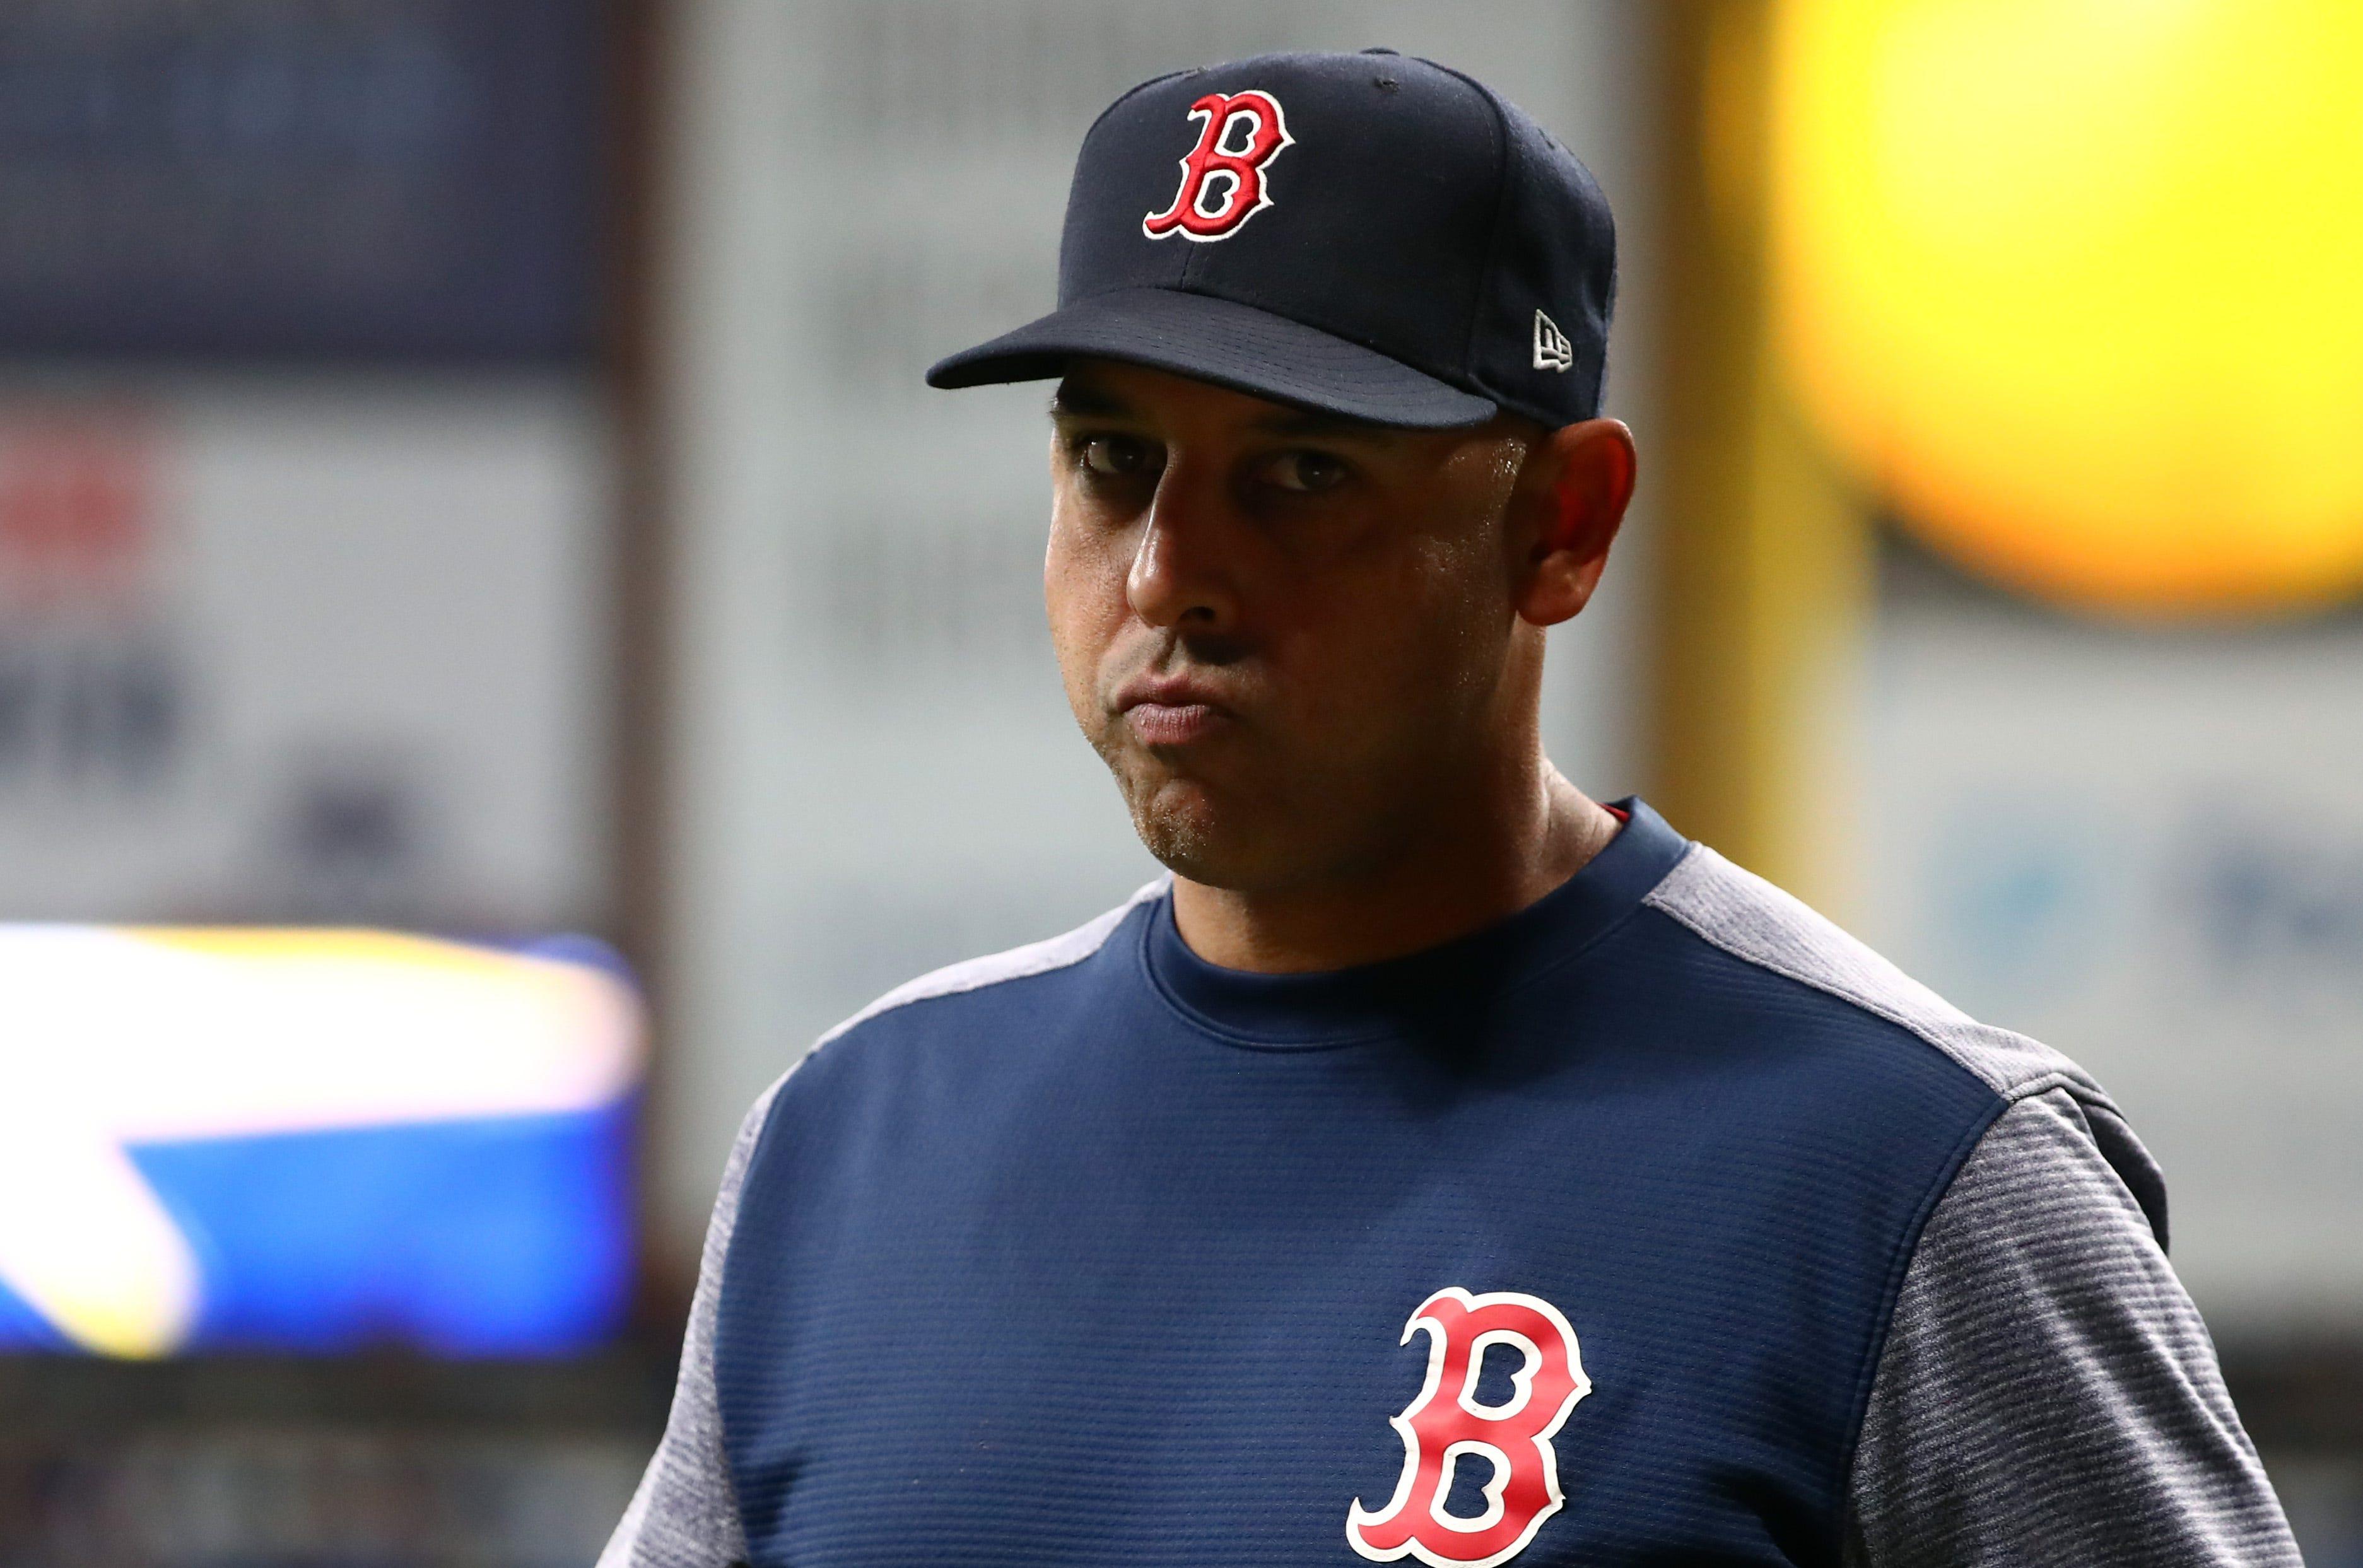 Astros Cheating Scandal Carlos Beltran In Odd Spot As Mets